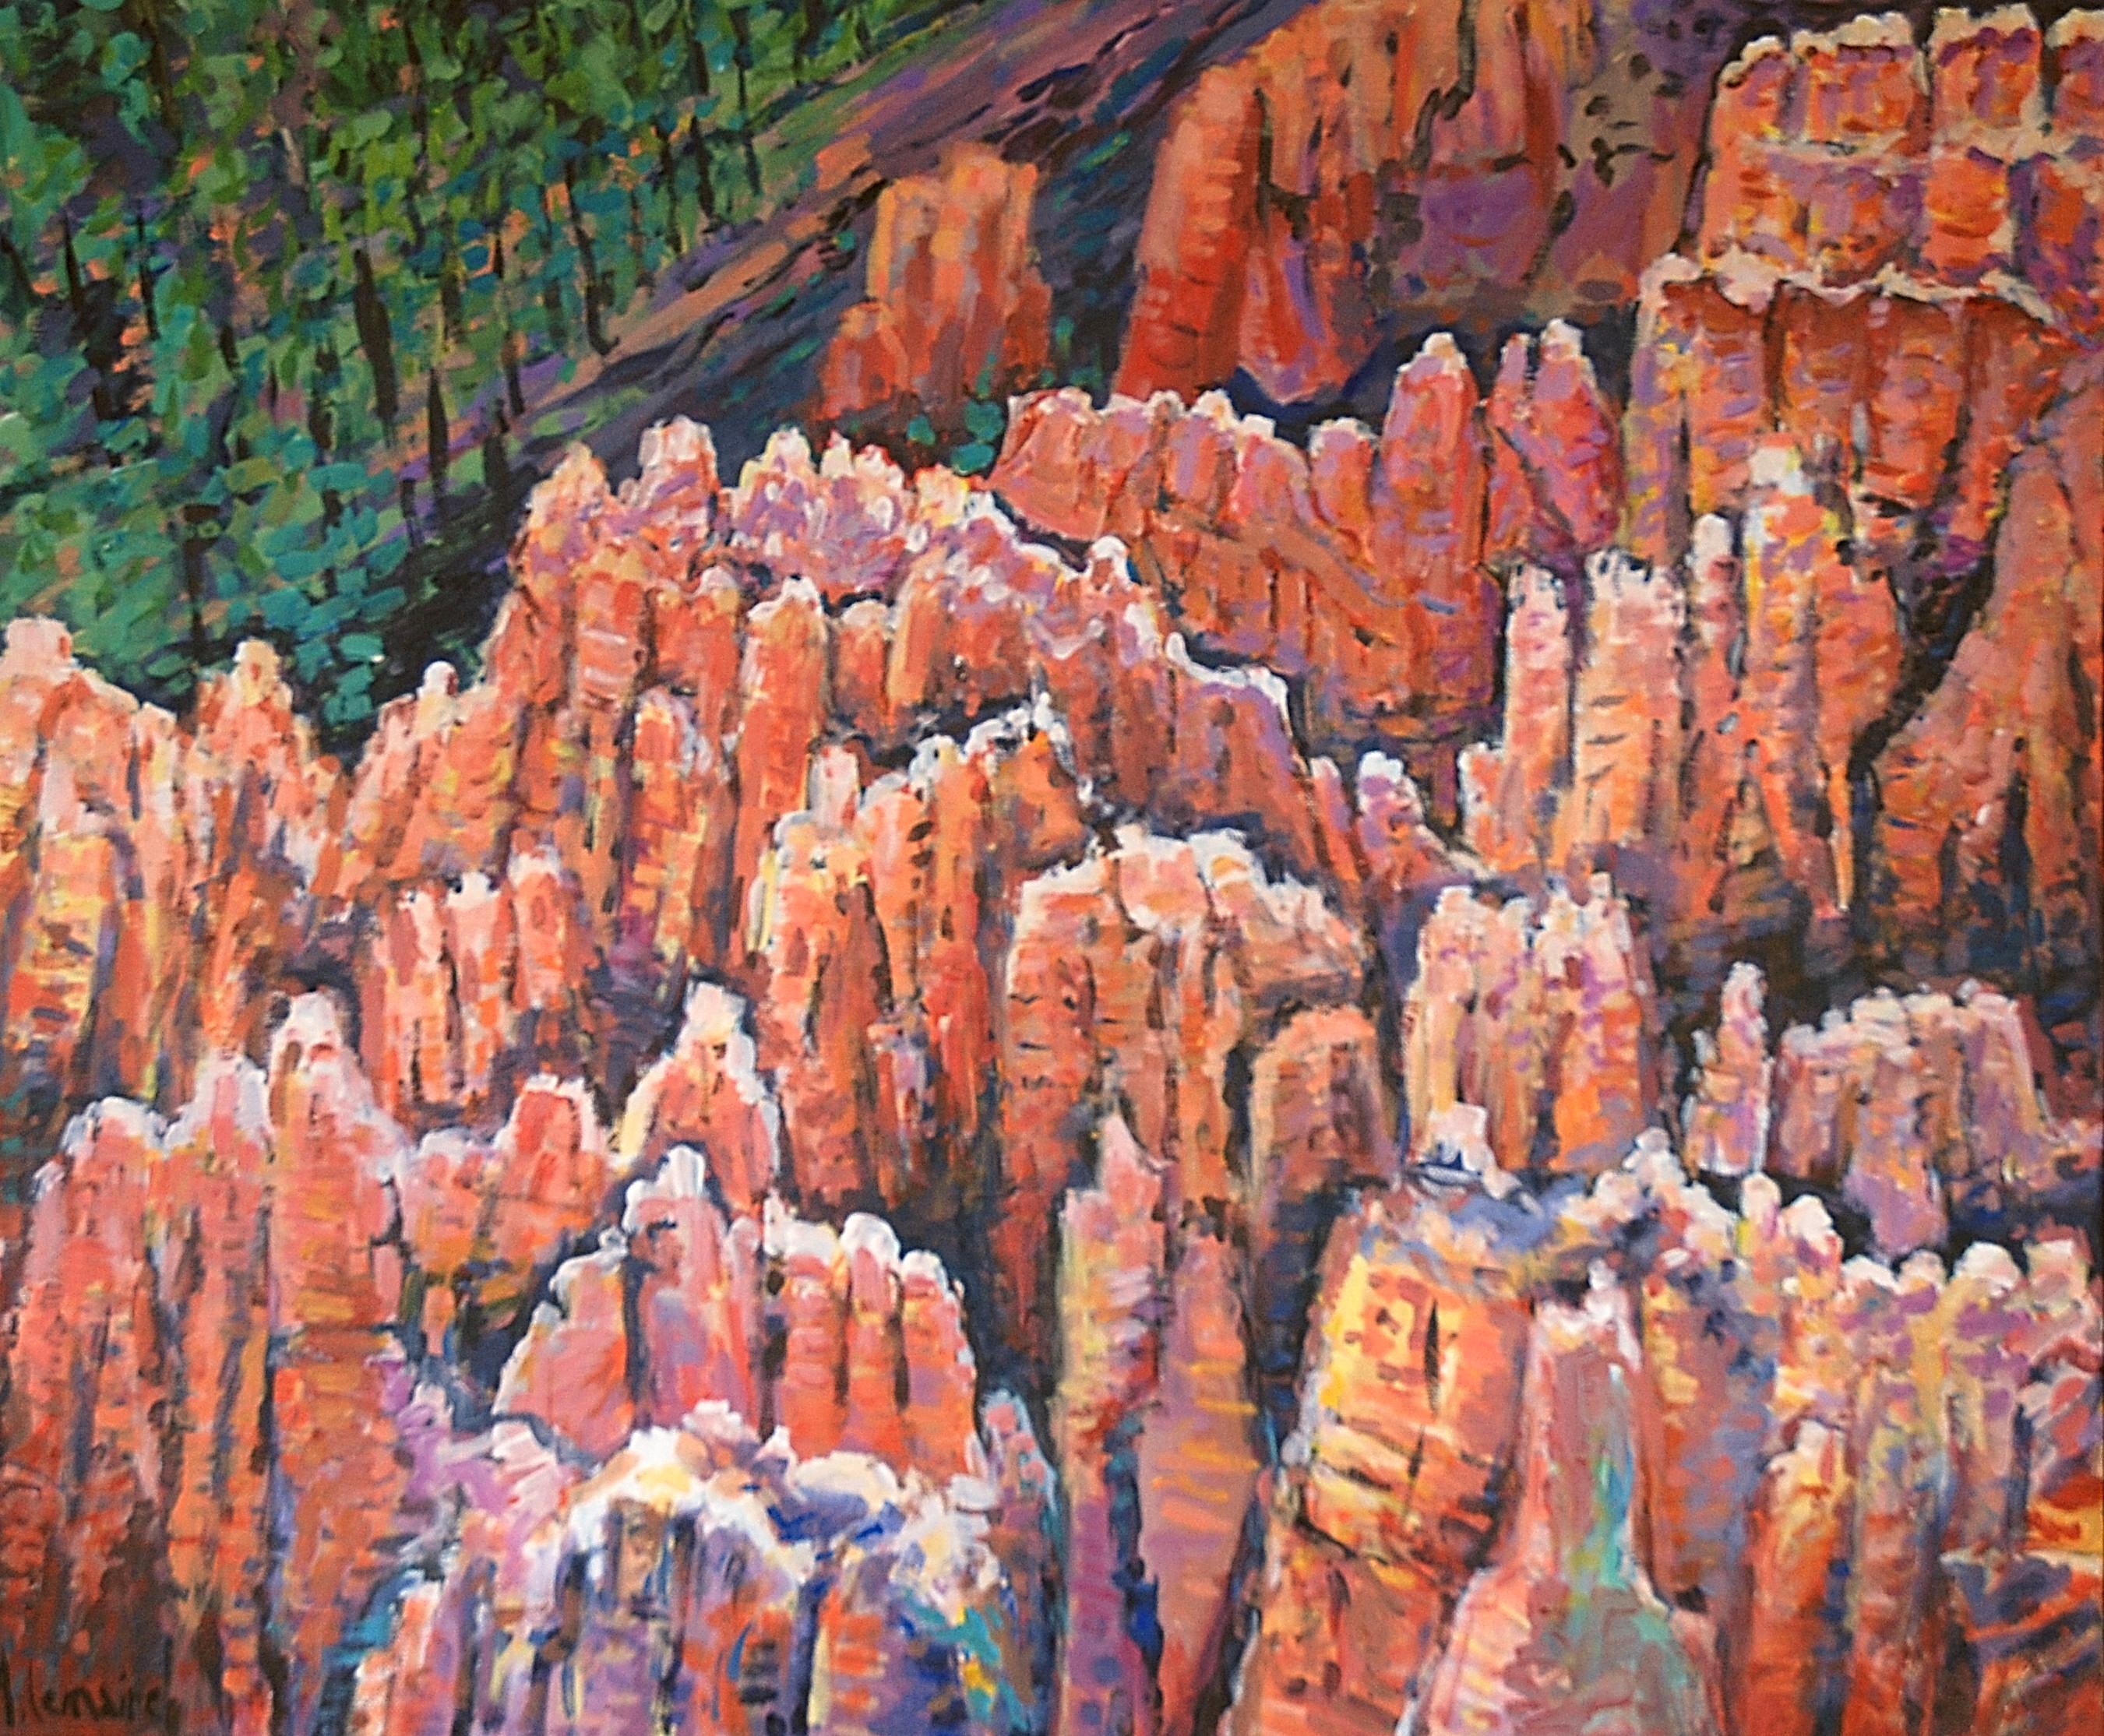 """Fantômes indiens"" à Bryce canyon"